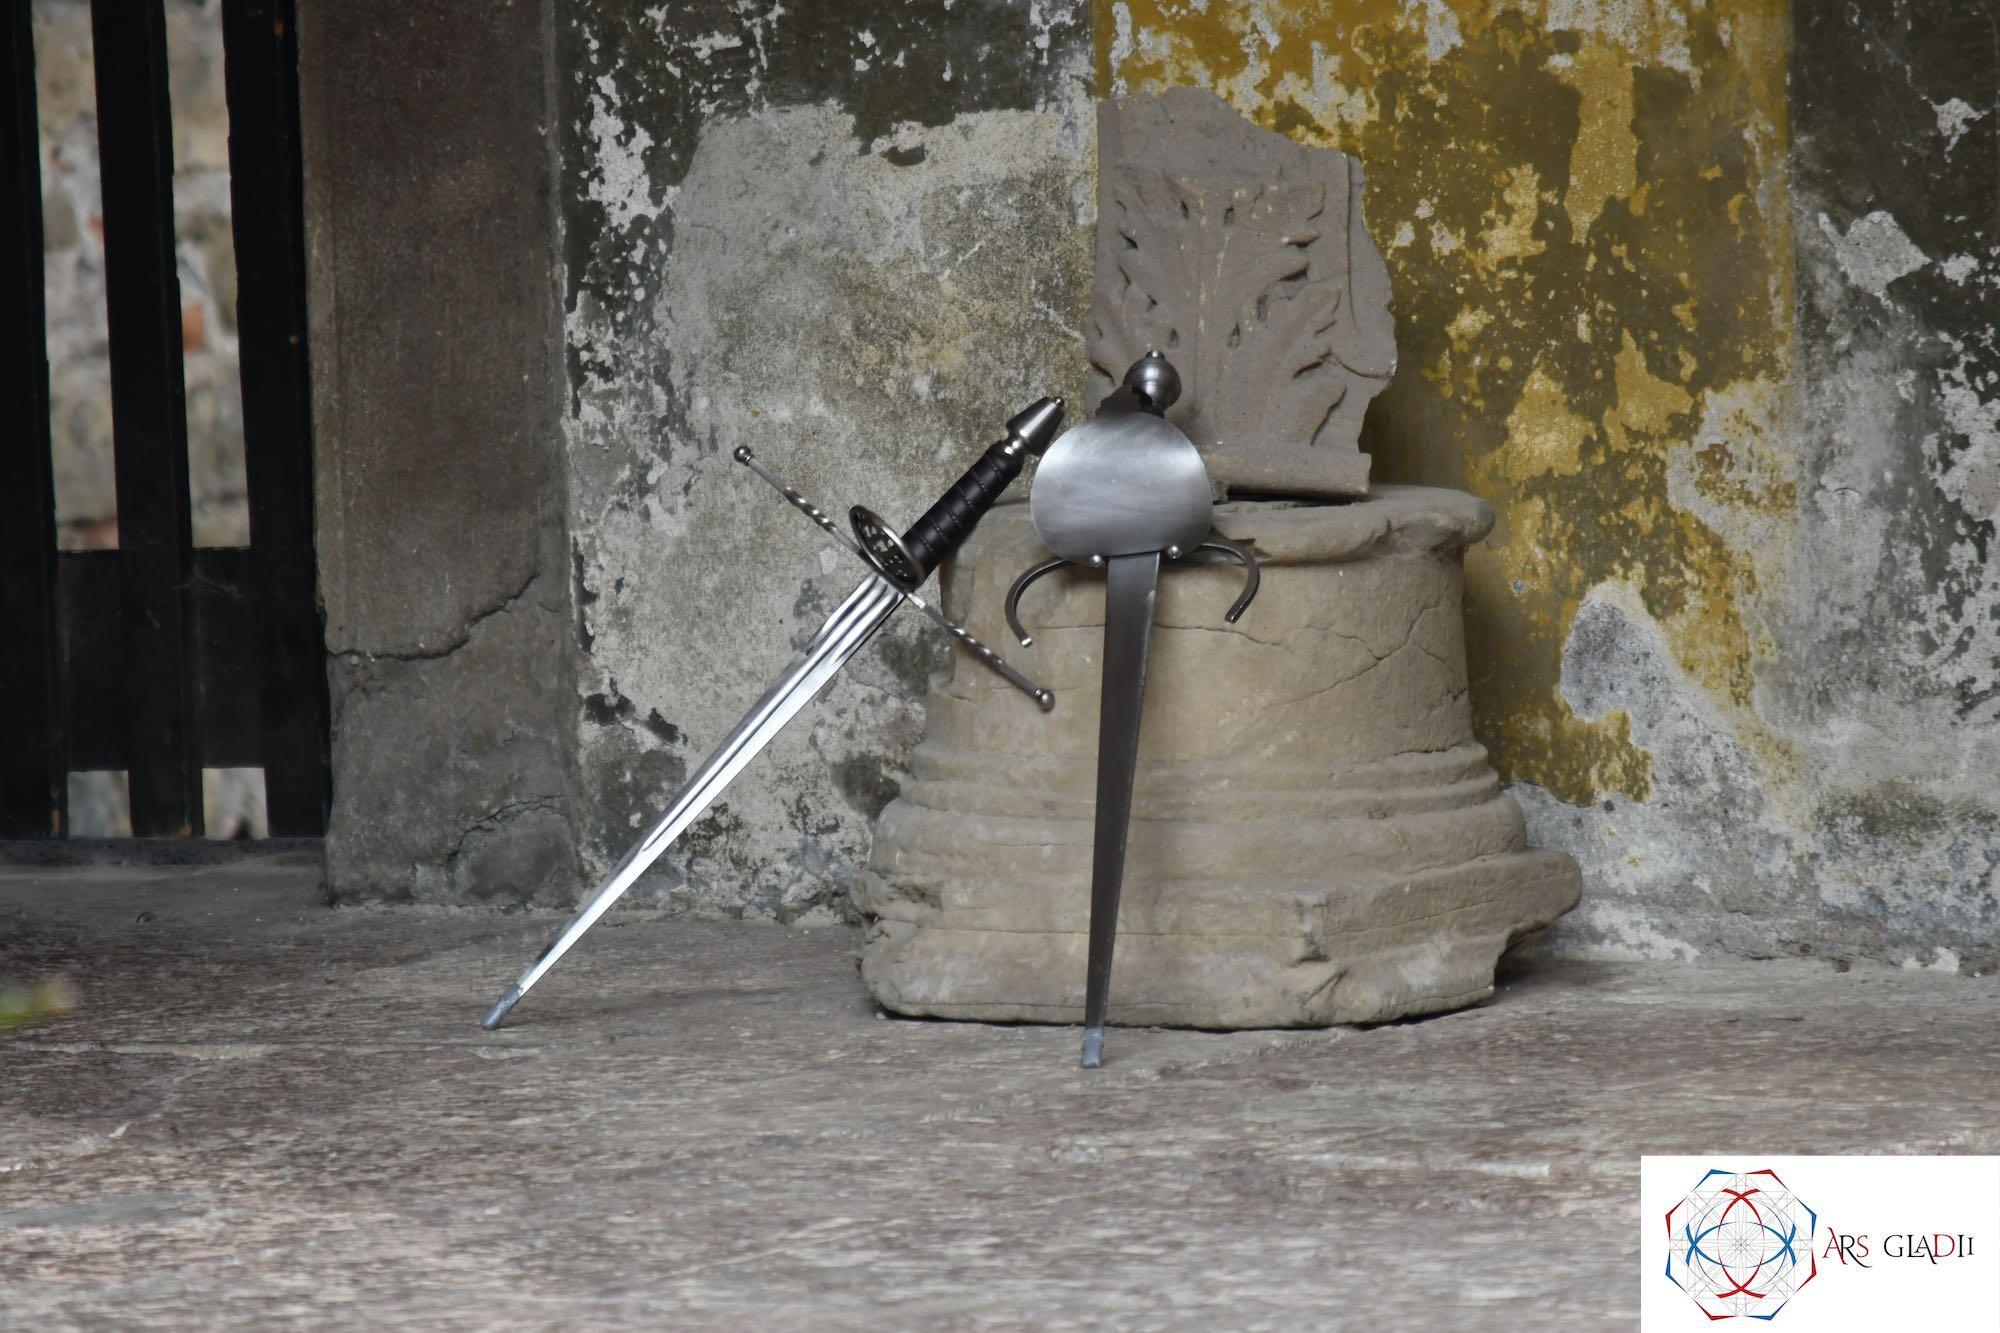 Ars Gladii - Foto materiali 5